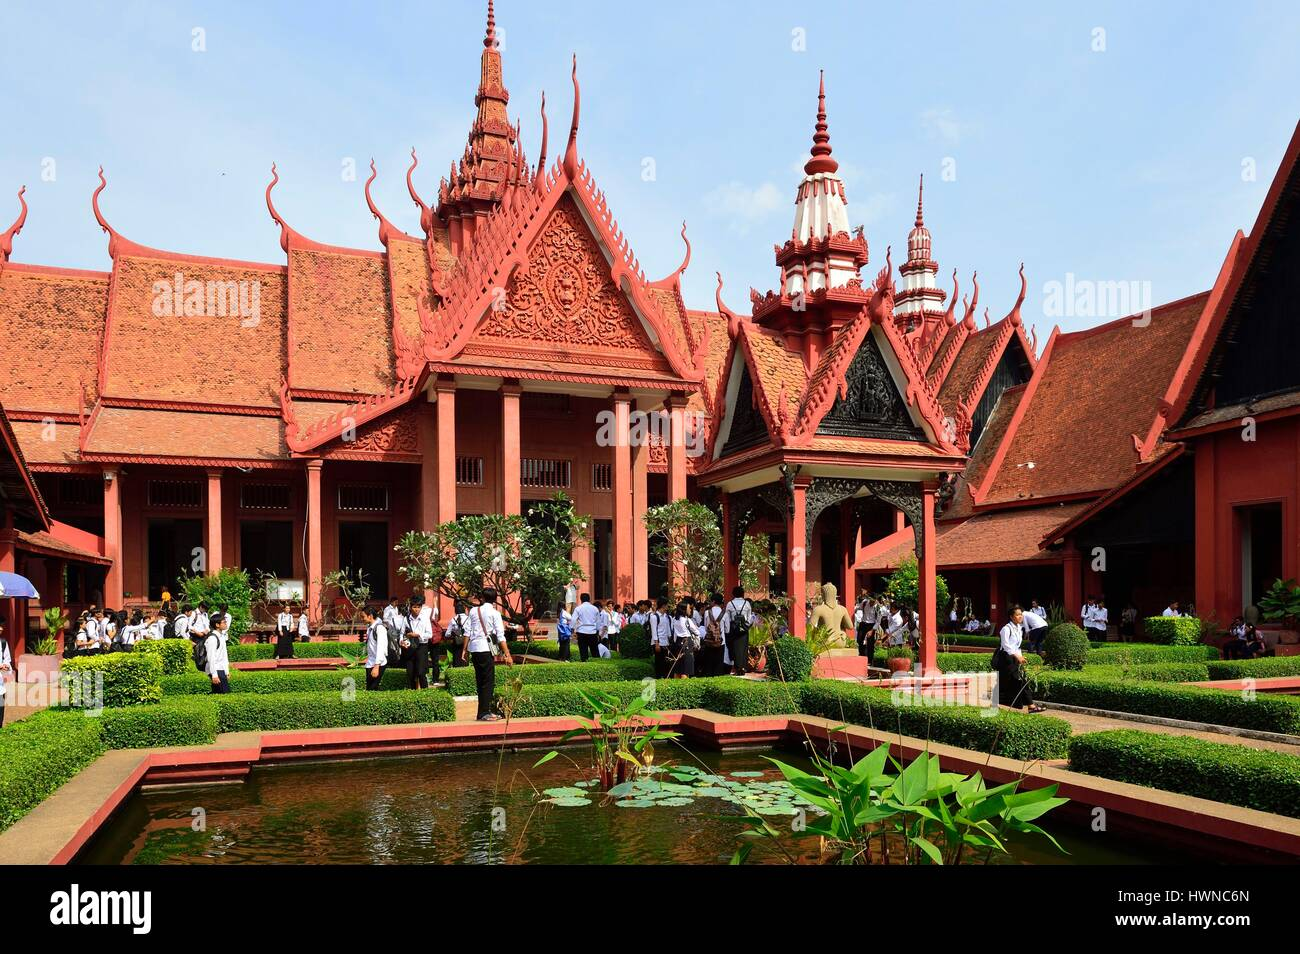 Cambodia, Phnom Penh, National Museum of Fine Arts - Stock Image